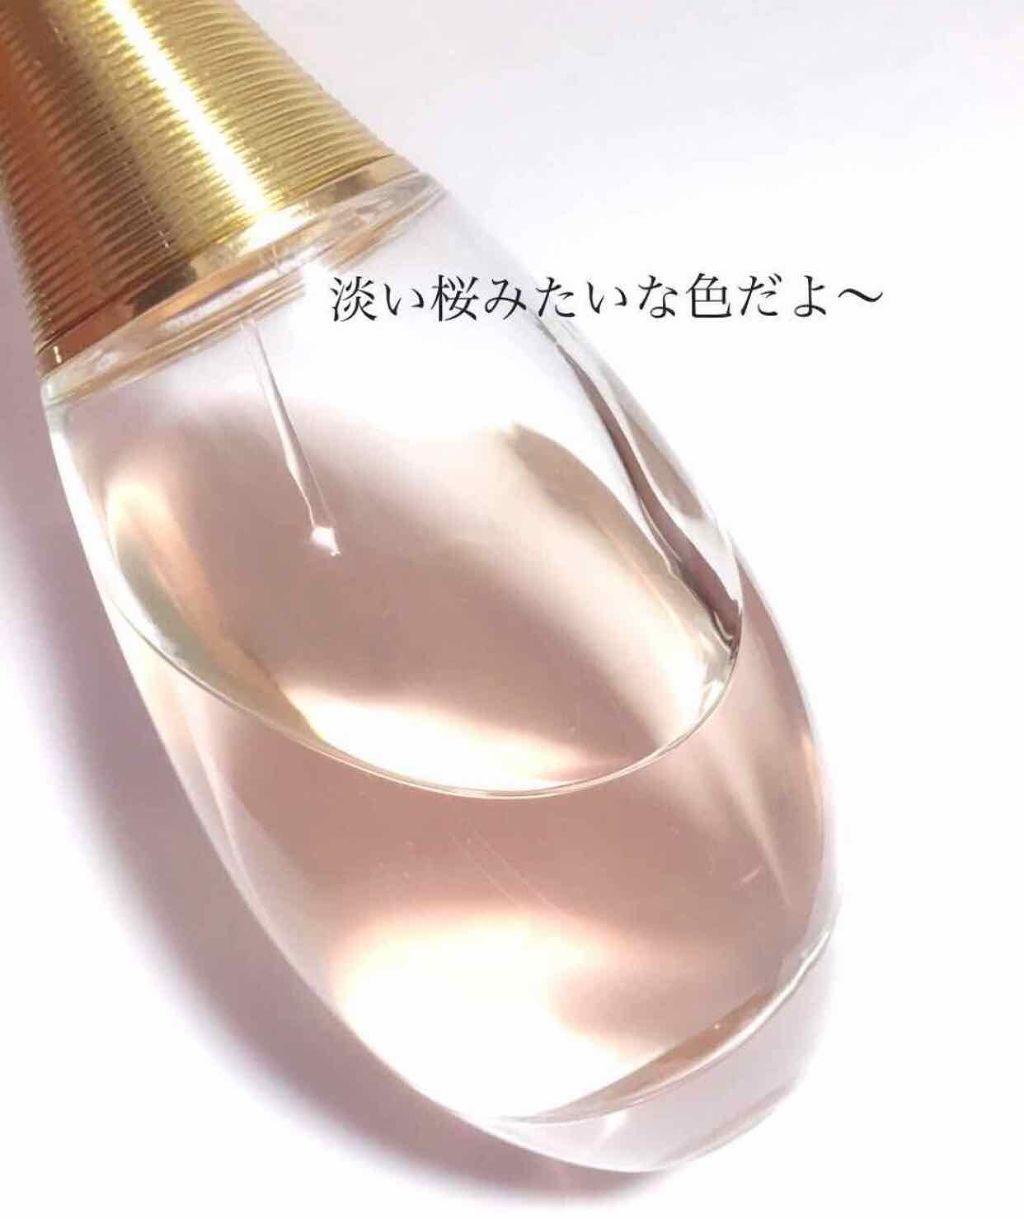 https://cdn.lipscosme.com/image/0927dcfa7cf7ab4f129df9e0-1548165278-thumb.png